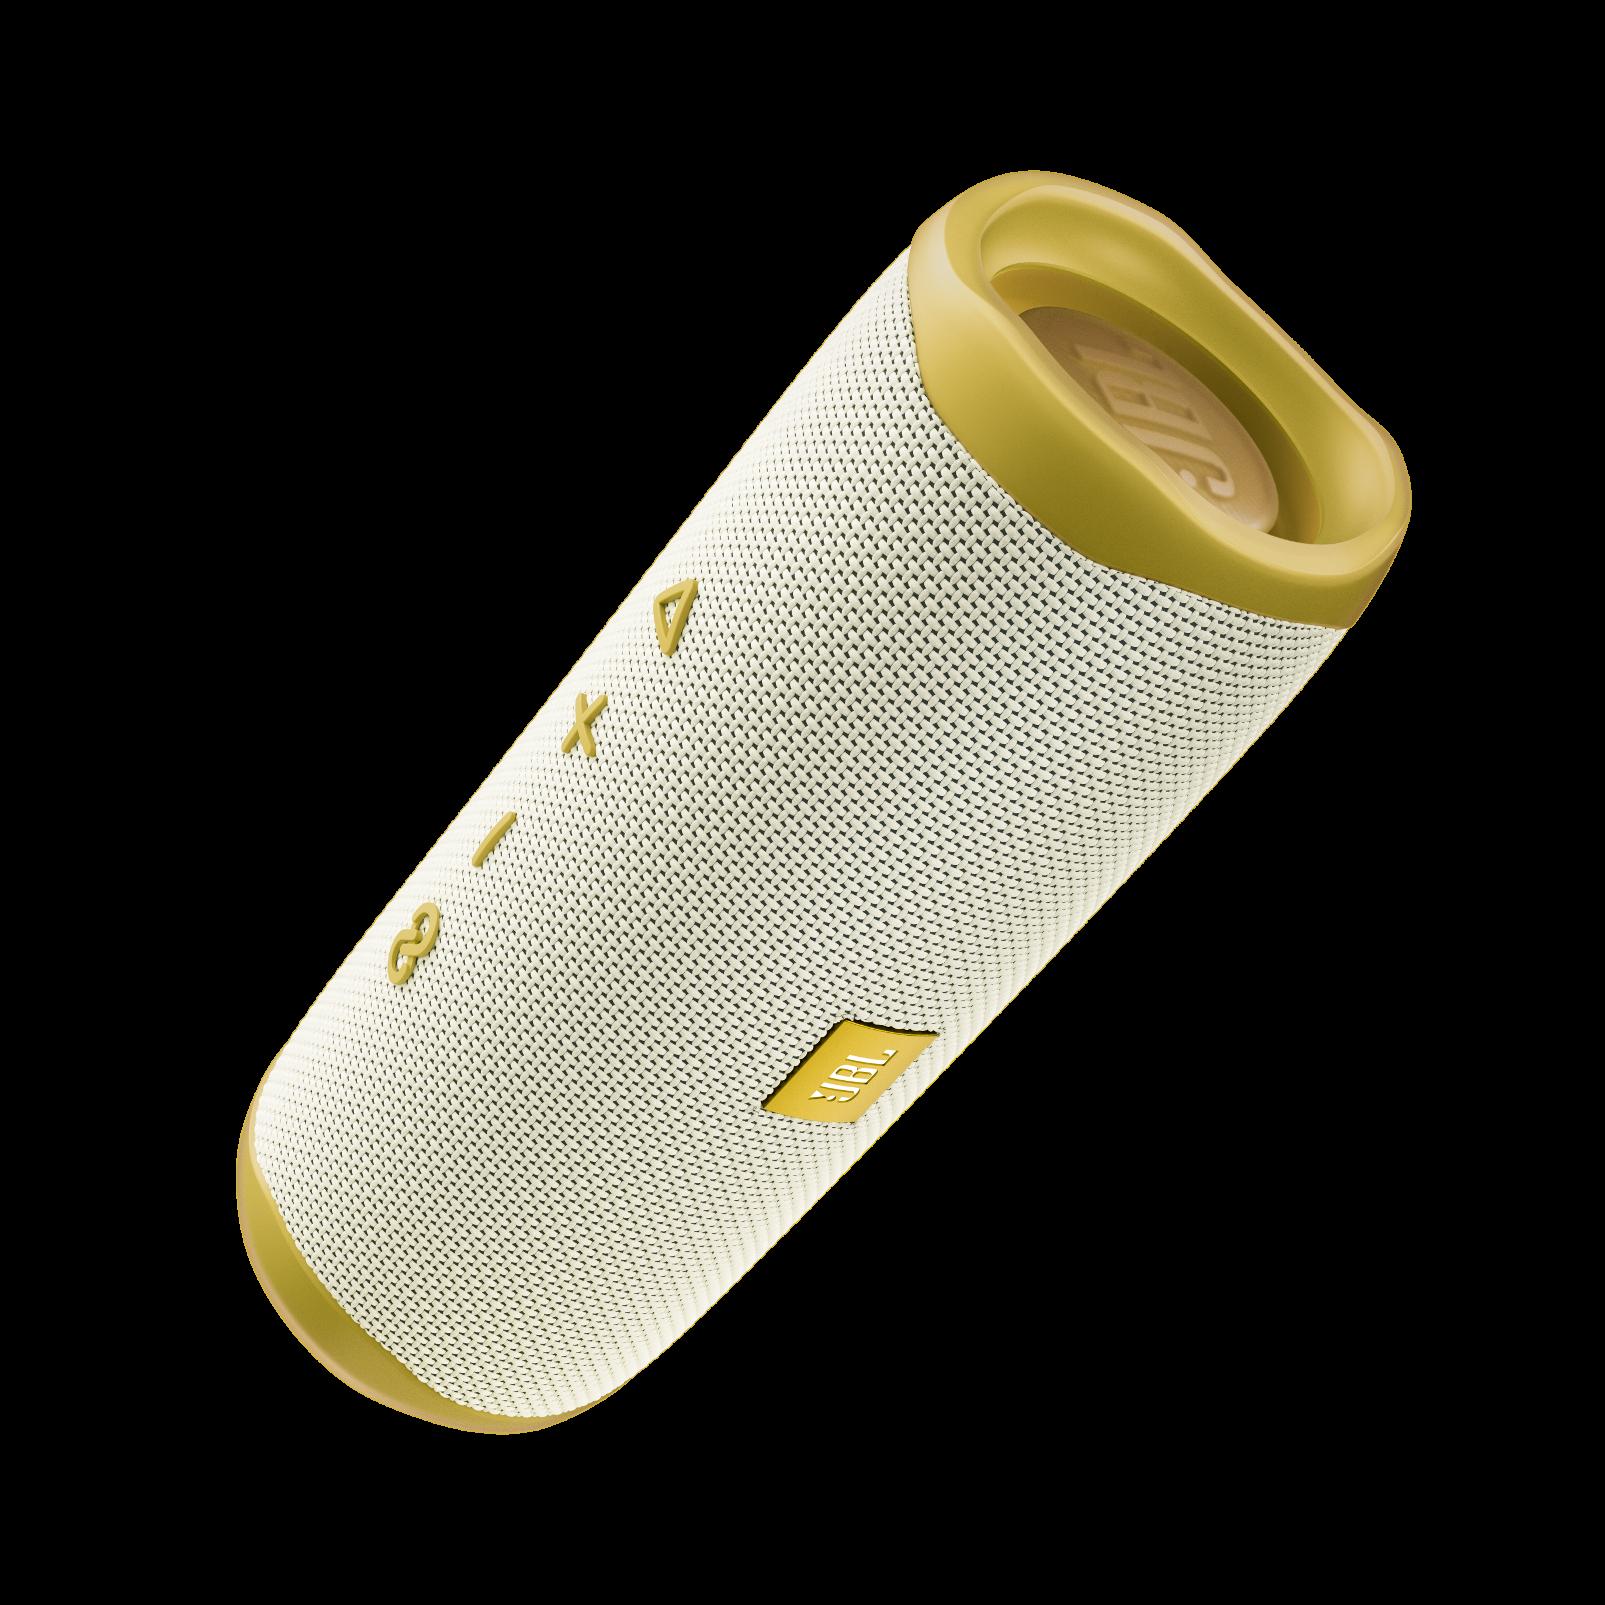 JBL Flip 5 Tomorrowland Edition - Gold/White - Portable Waterproof Speaker - Front